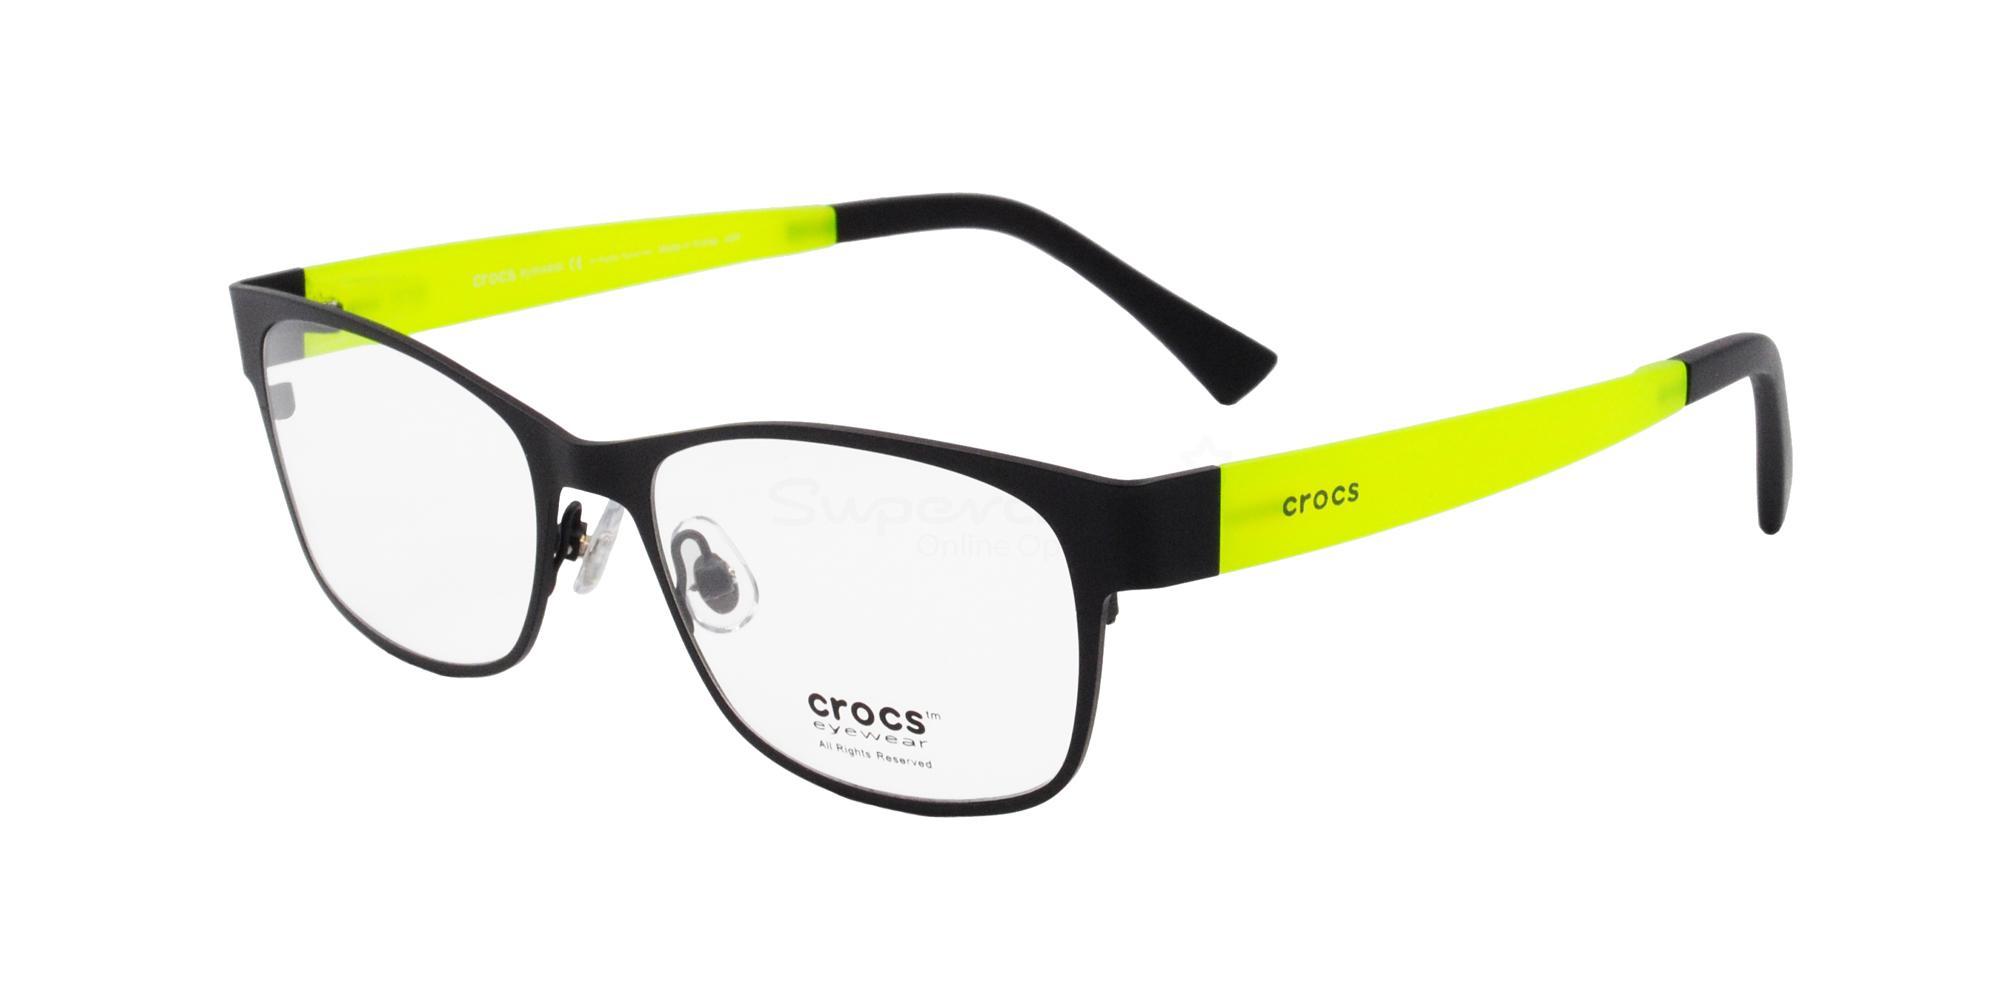 20GN CF643 Glasses, Crocs Eyewear